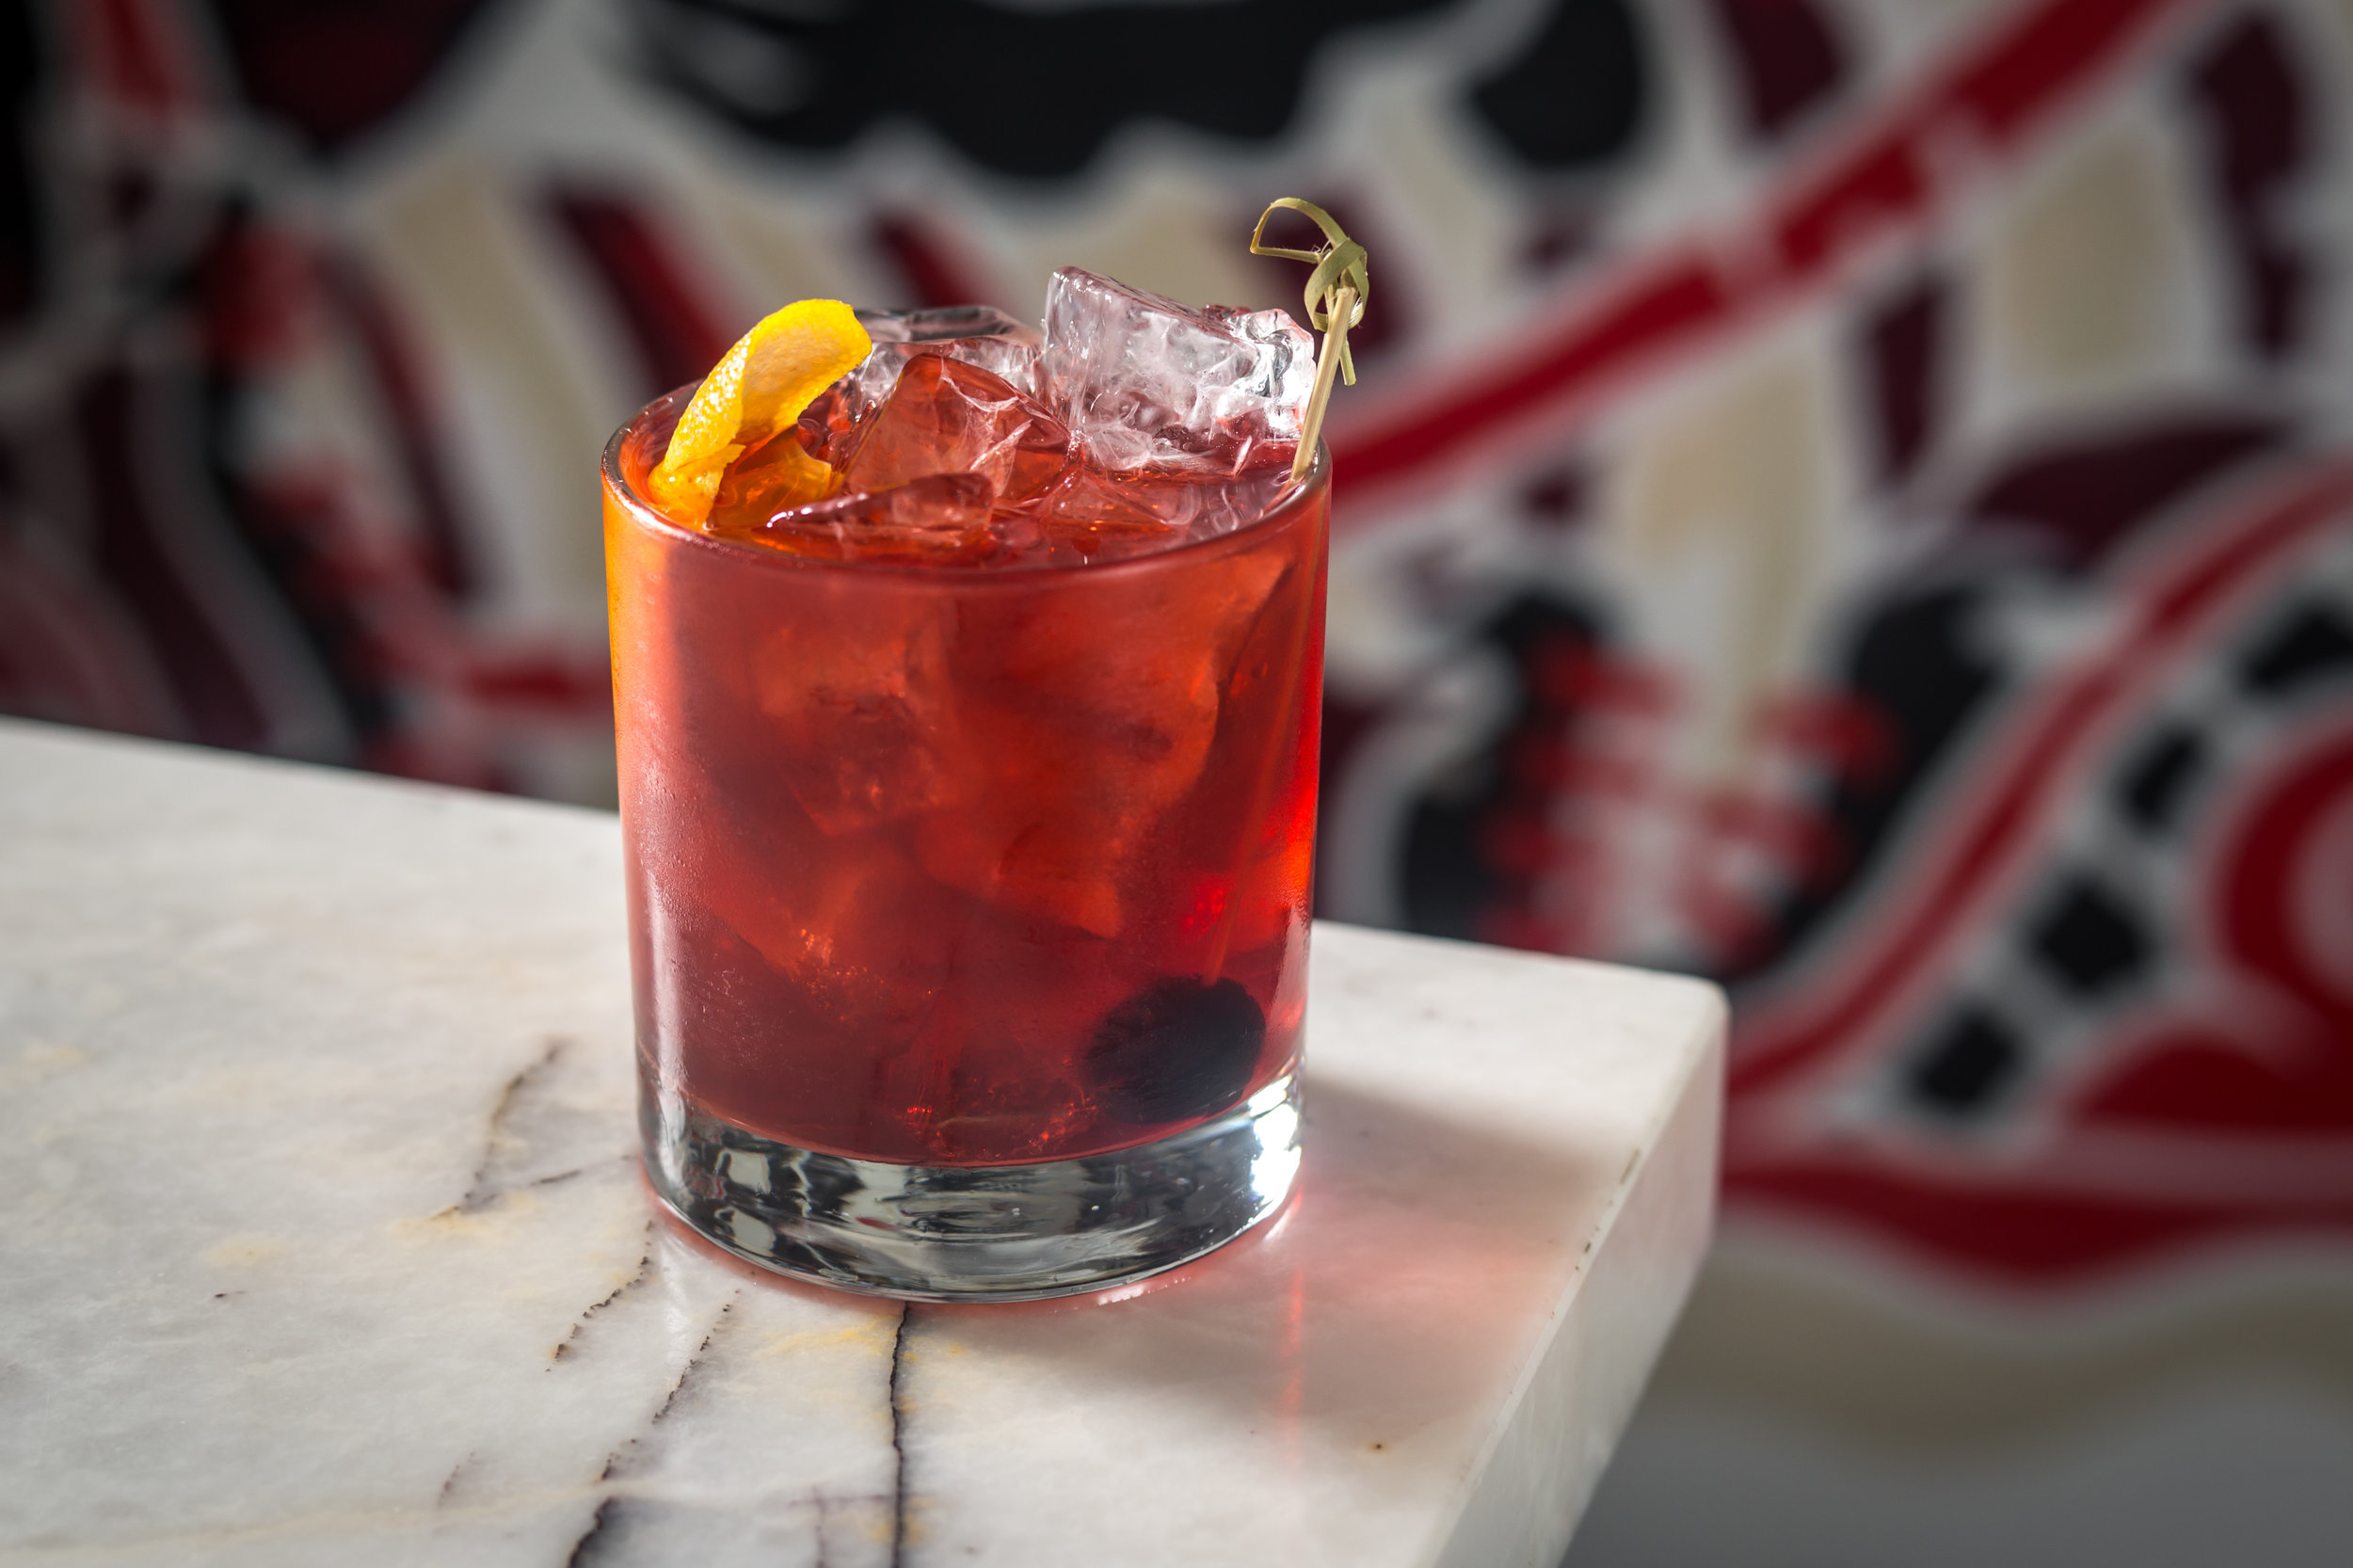 Nom Wah Tu Cocktail Feast Meets West Sophie Maarleveld Phillip Szabados